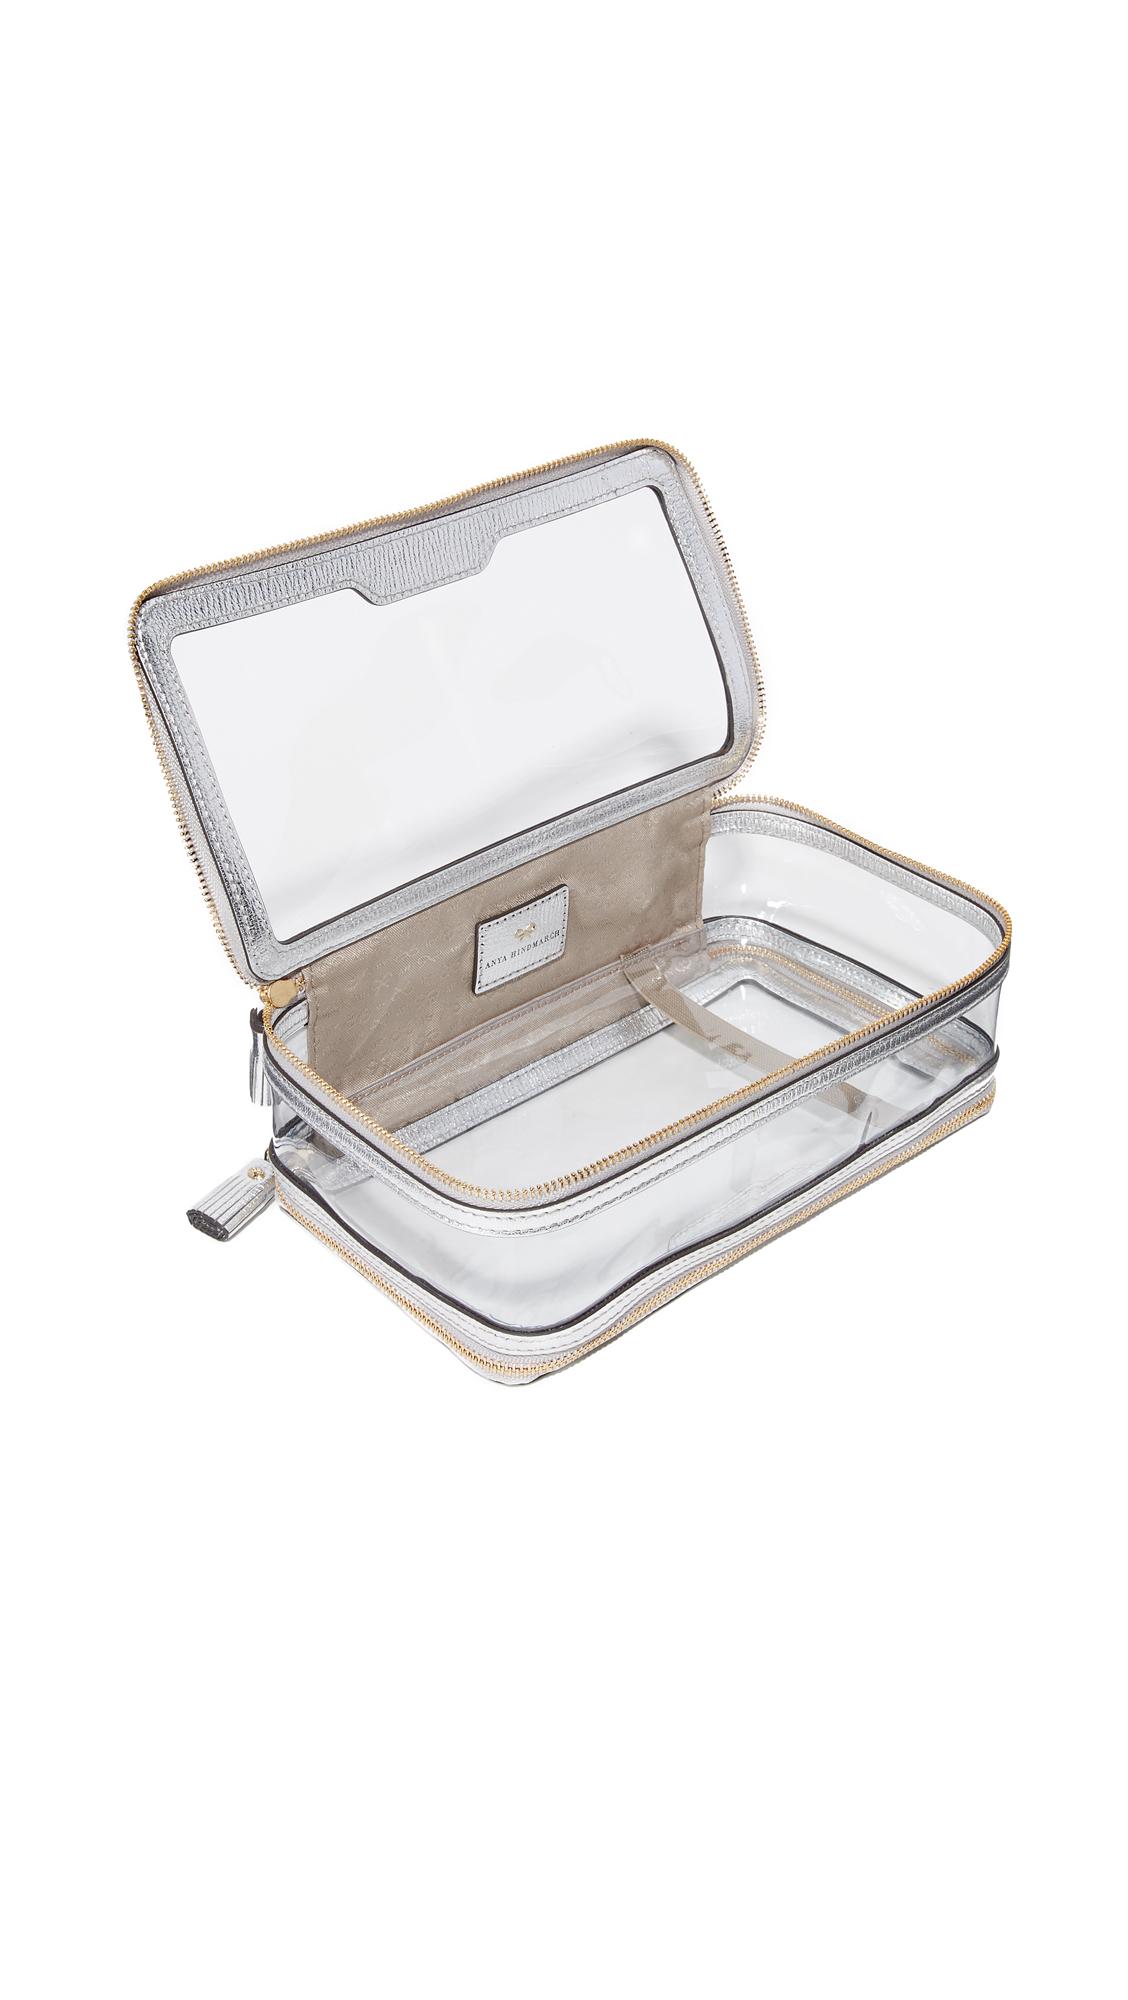 Anya Hindmarch Clear Travel Bag